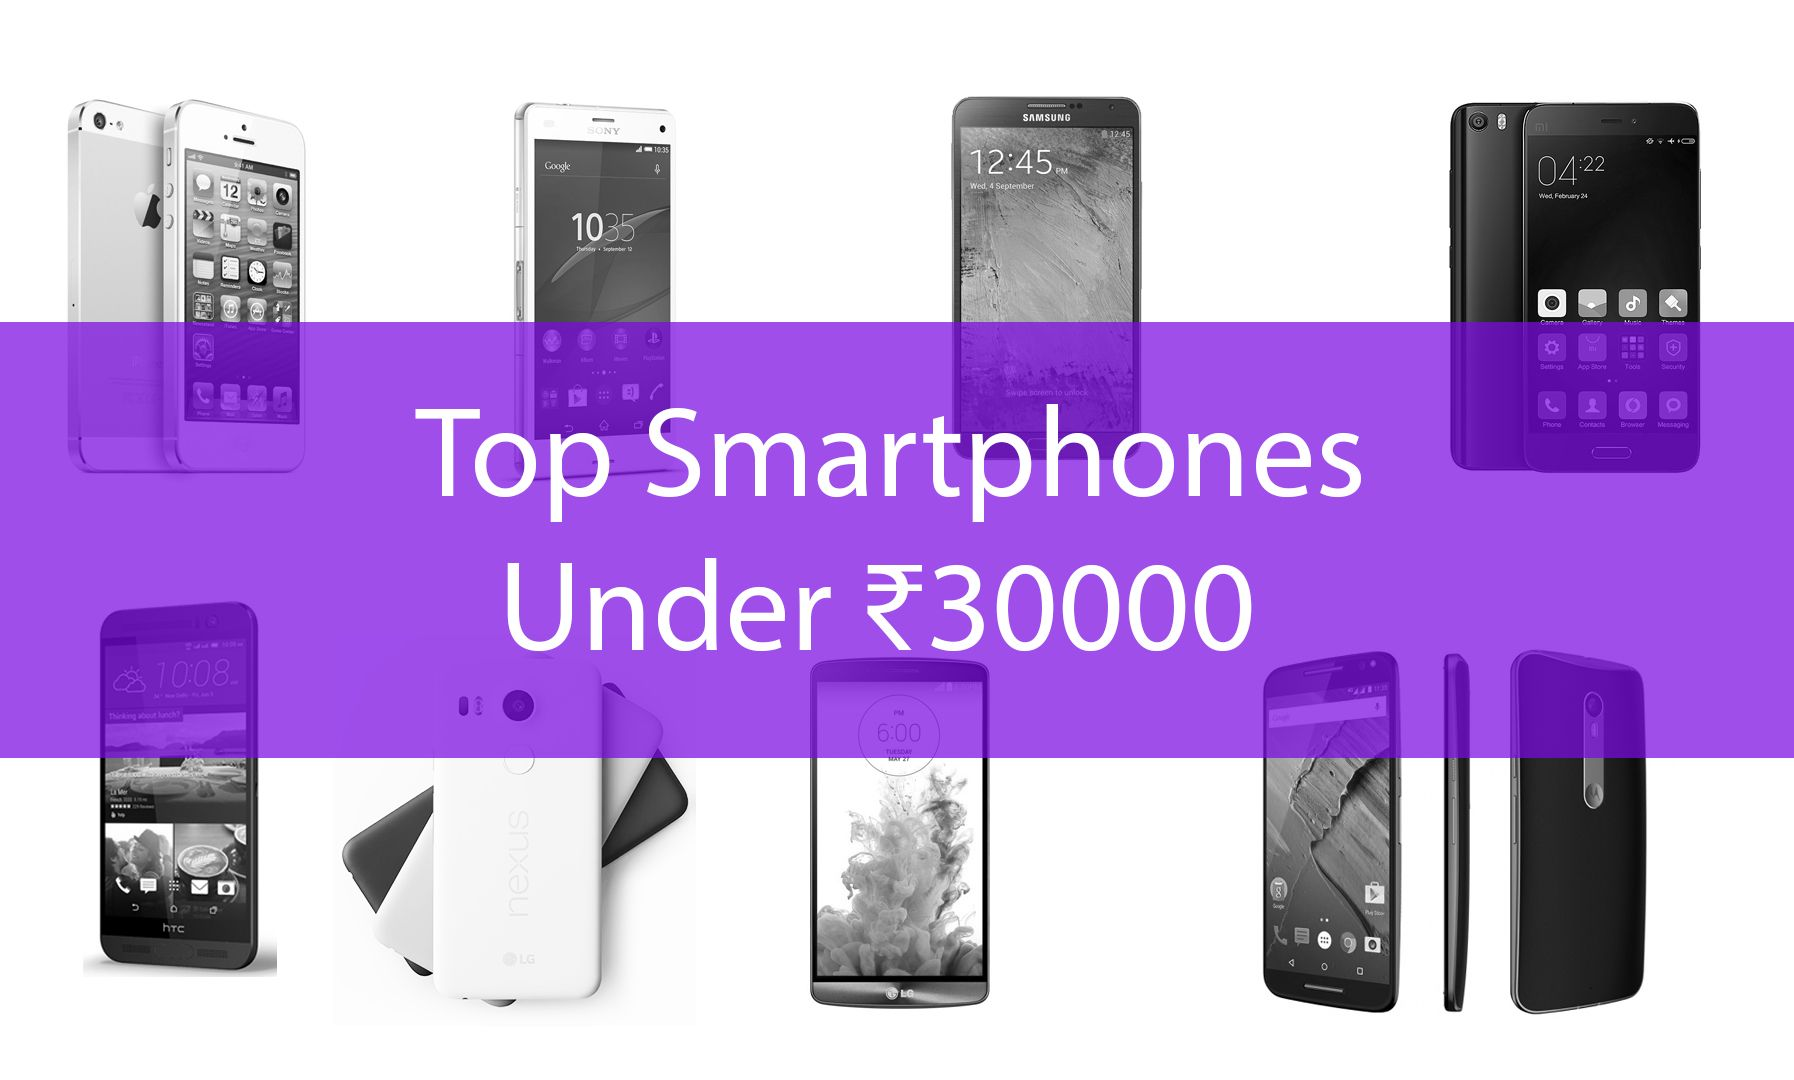 Pin by Tech Pickings on Top Smartphones below Rs.30000 in